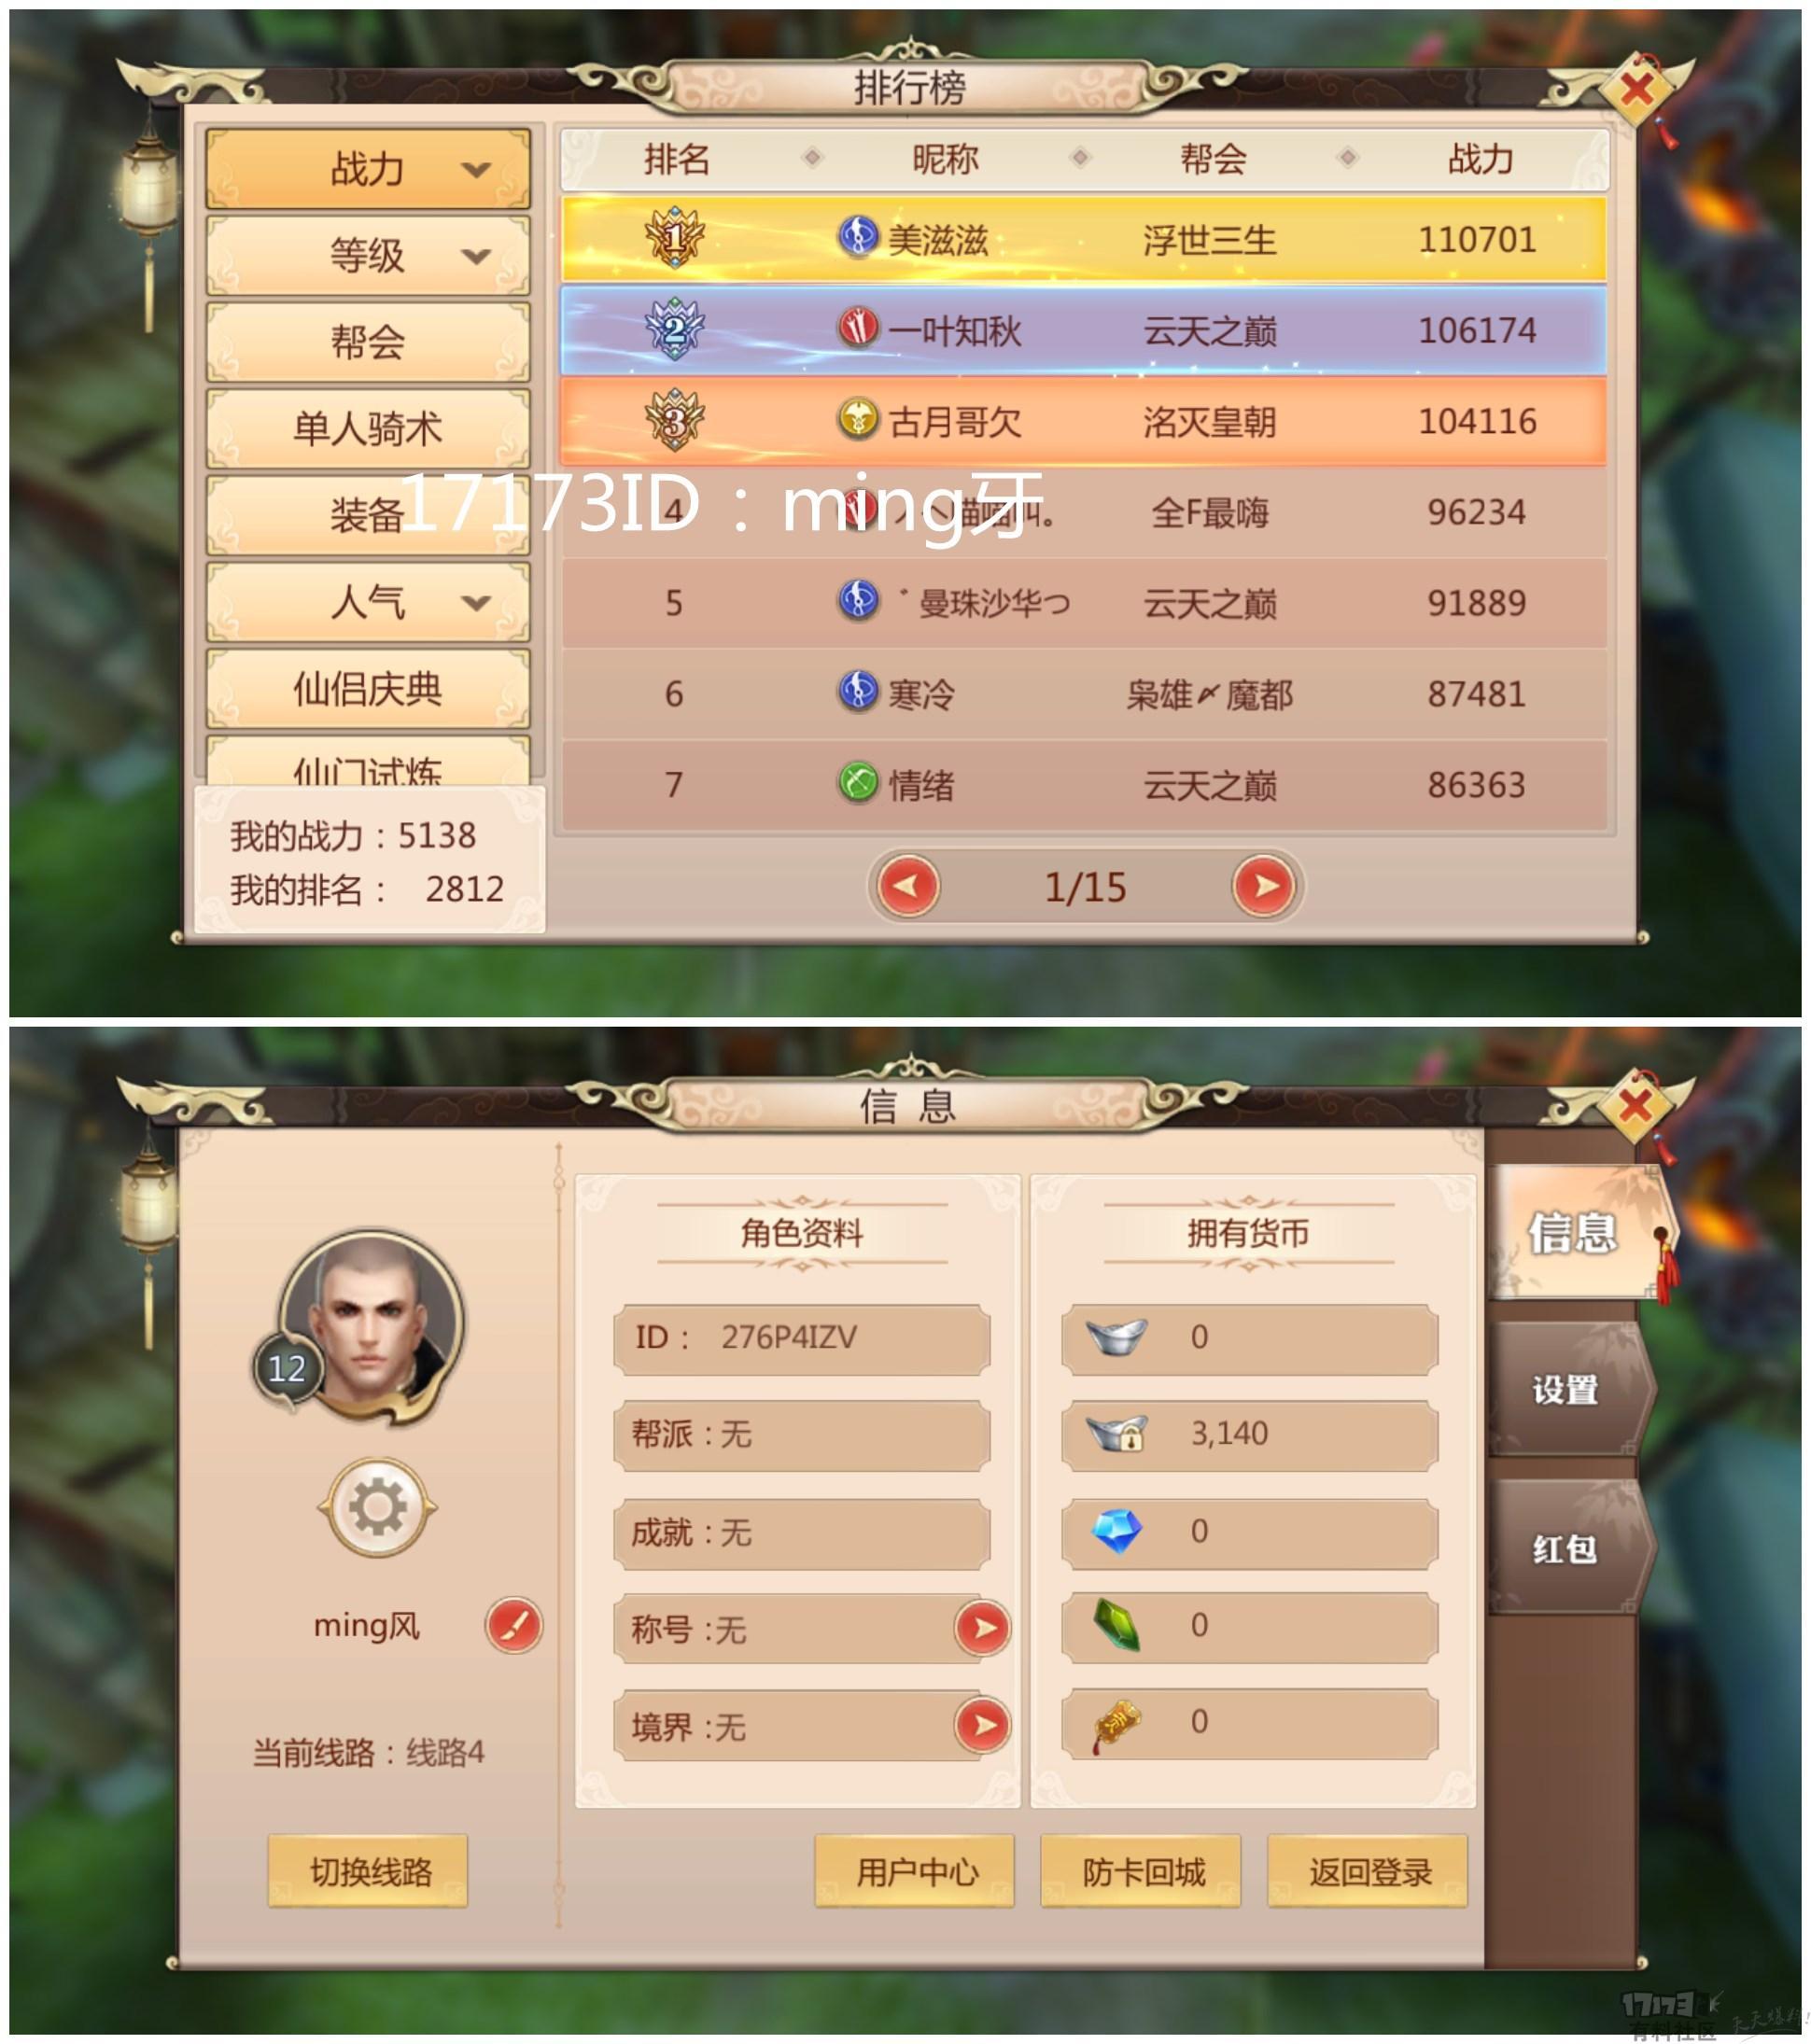 Screenshot_2018-04-27-22-15-04-087_com.ycgame.t11_副本.jpg